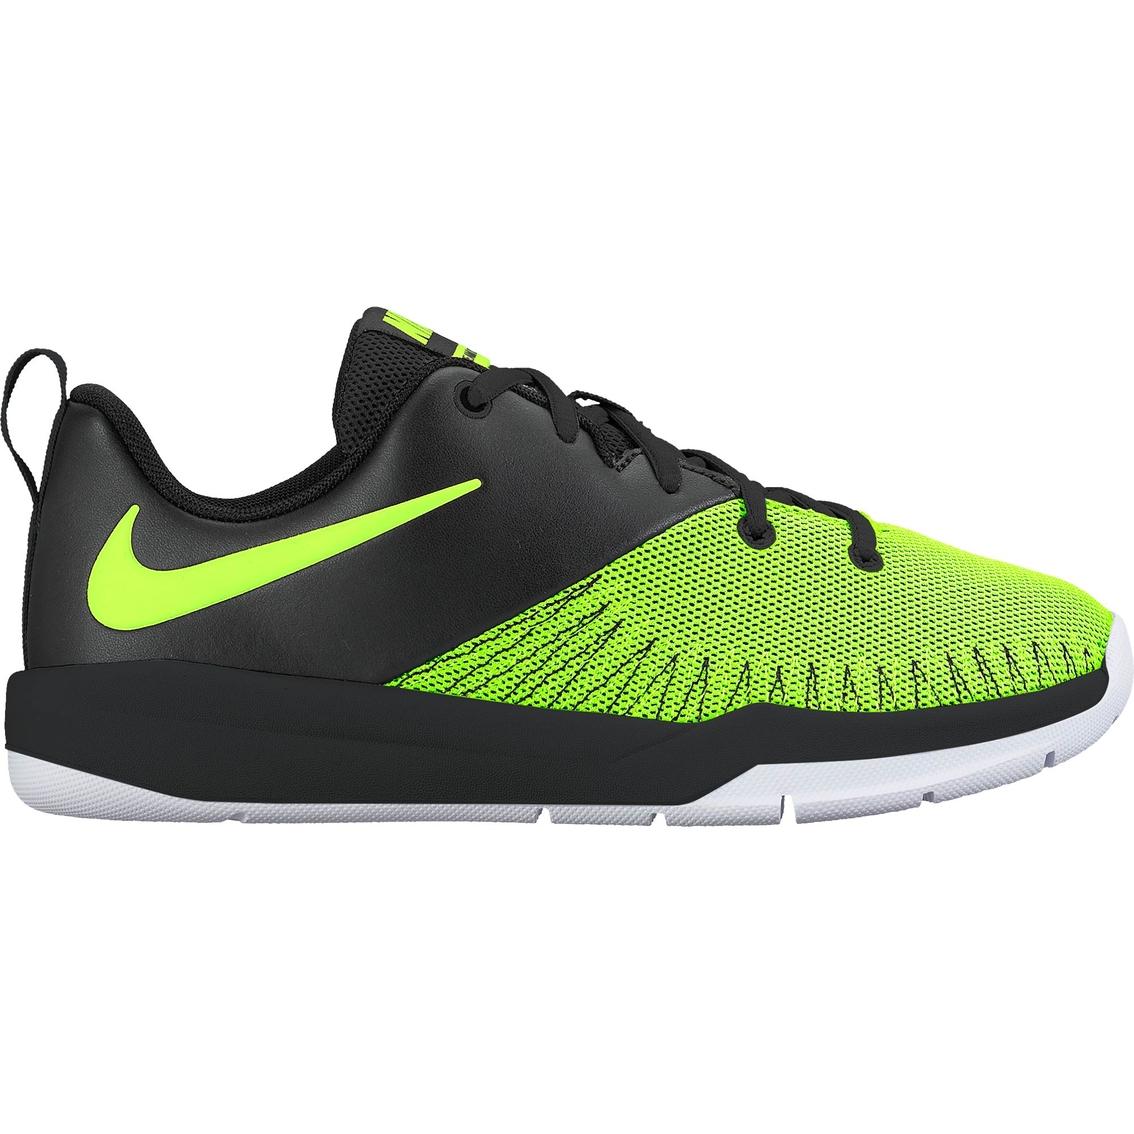 Nike Hustle Basketball Shoes 28 Images Nike Team